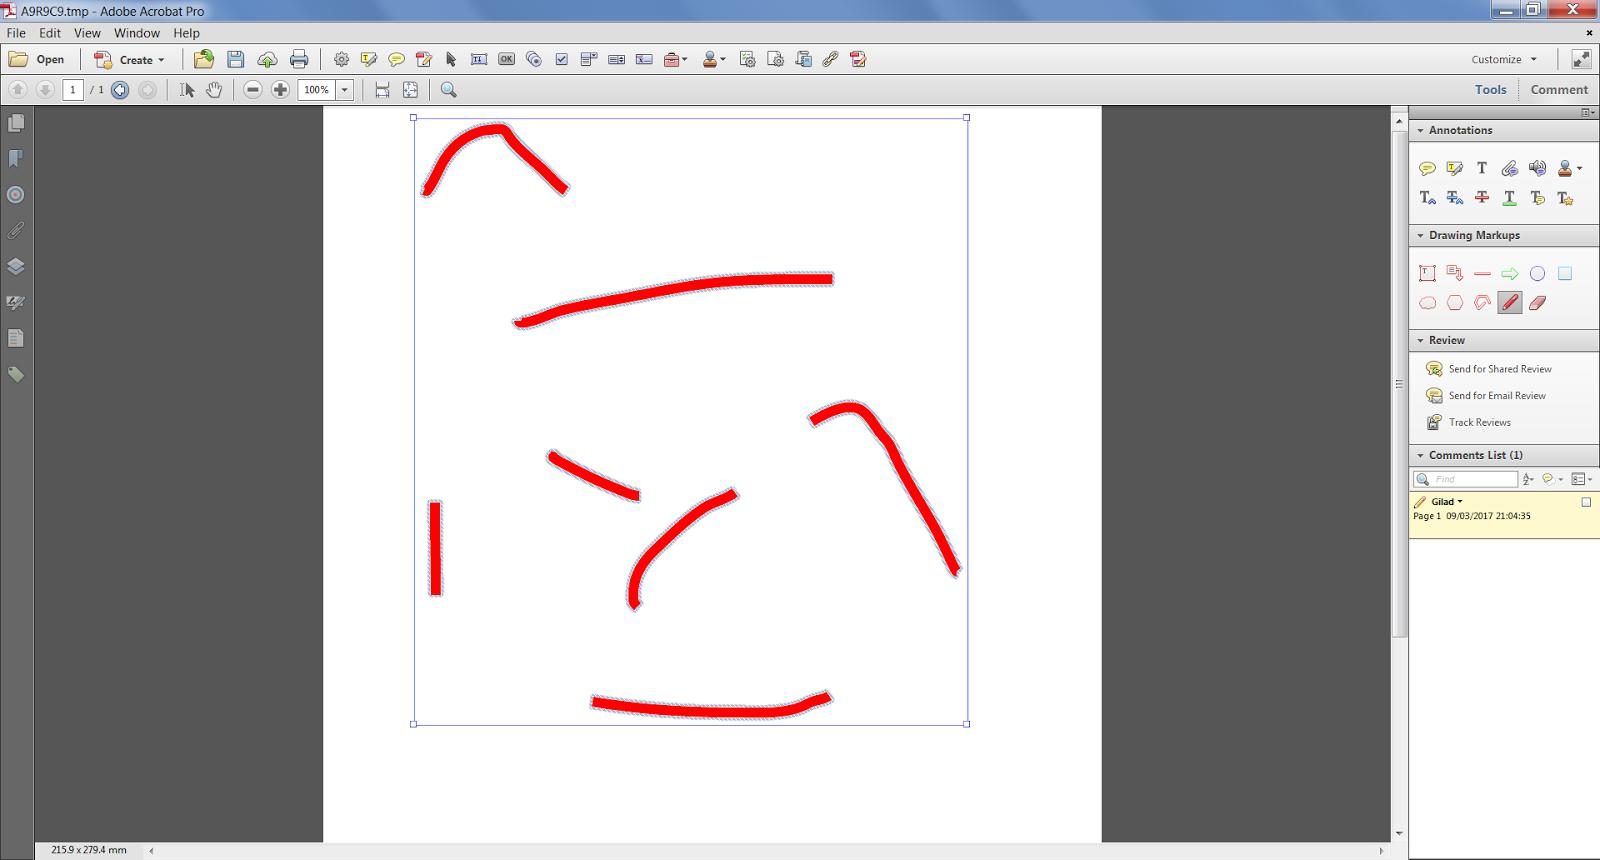 Custom-made Adobe Scripts: Acrobat/Reader -- Ungroup Pencil